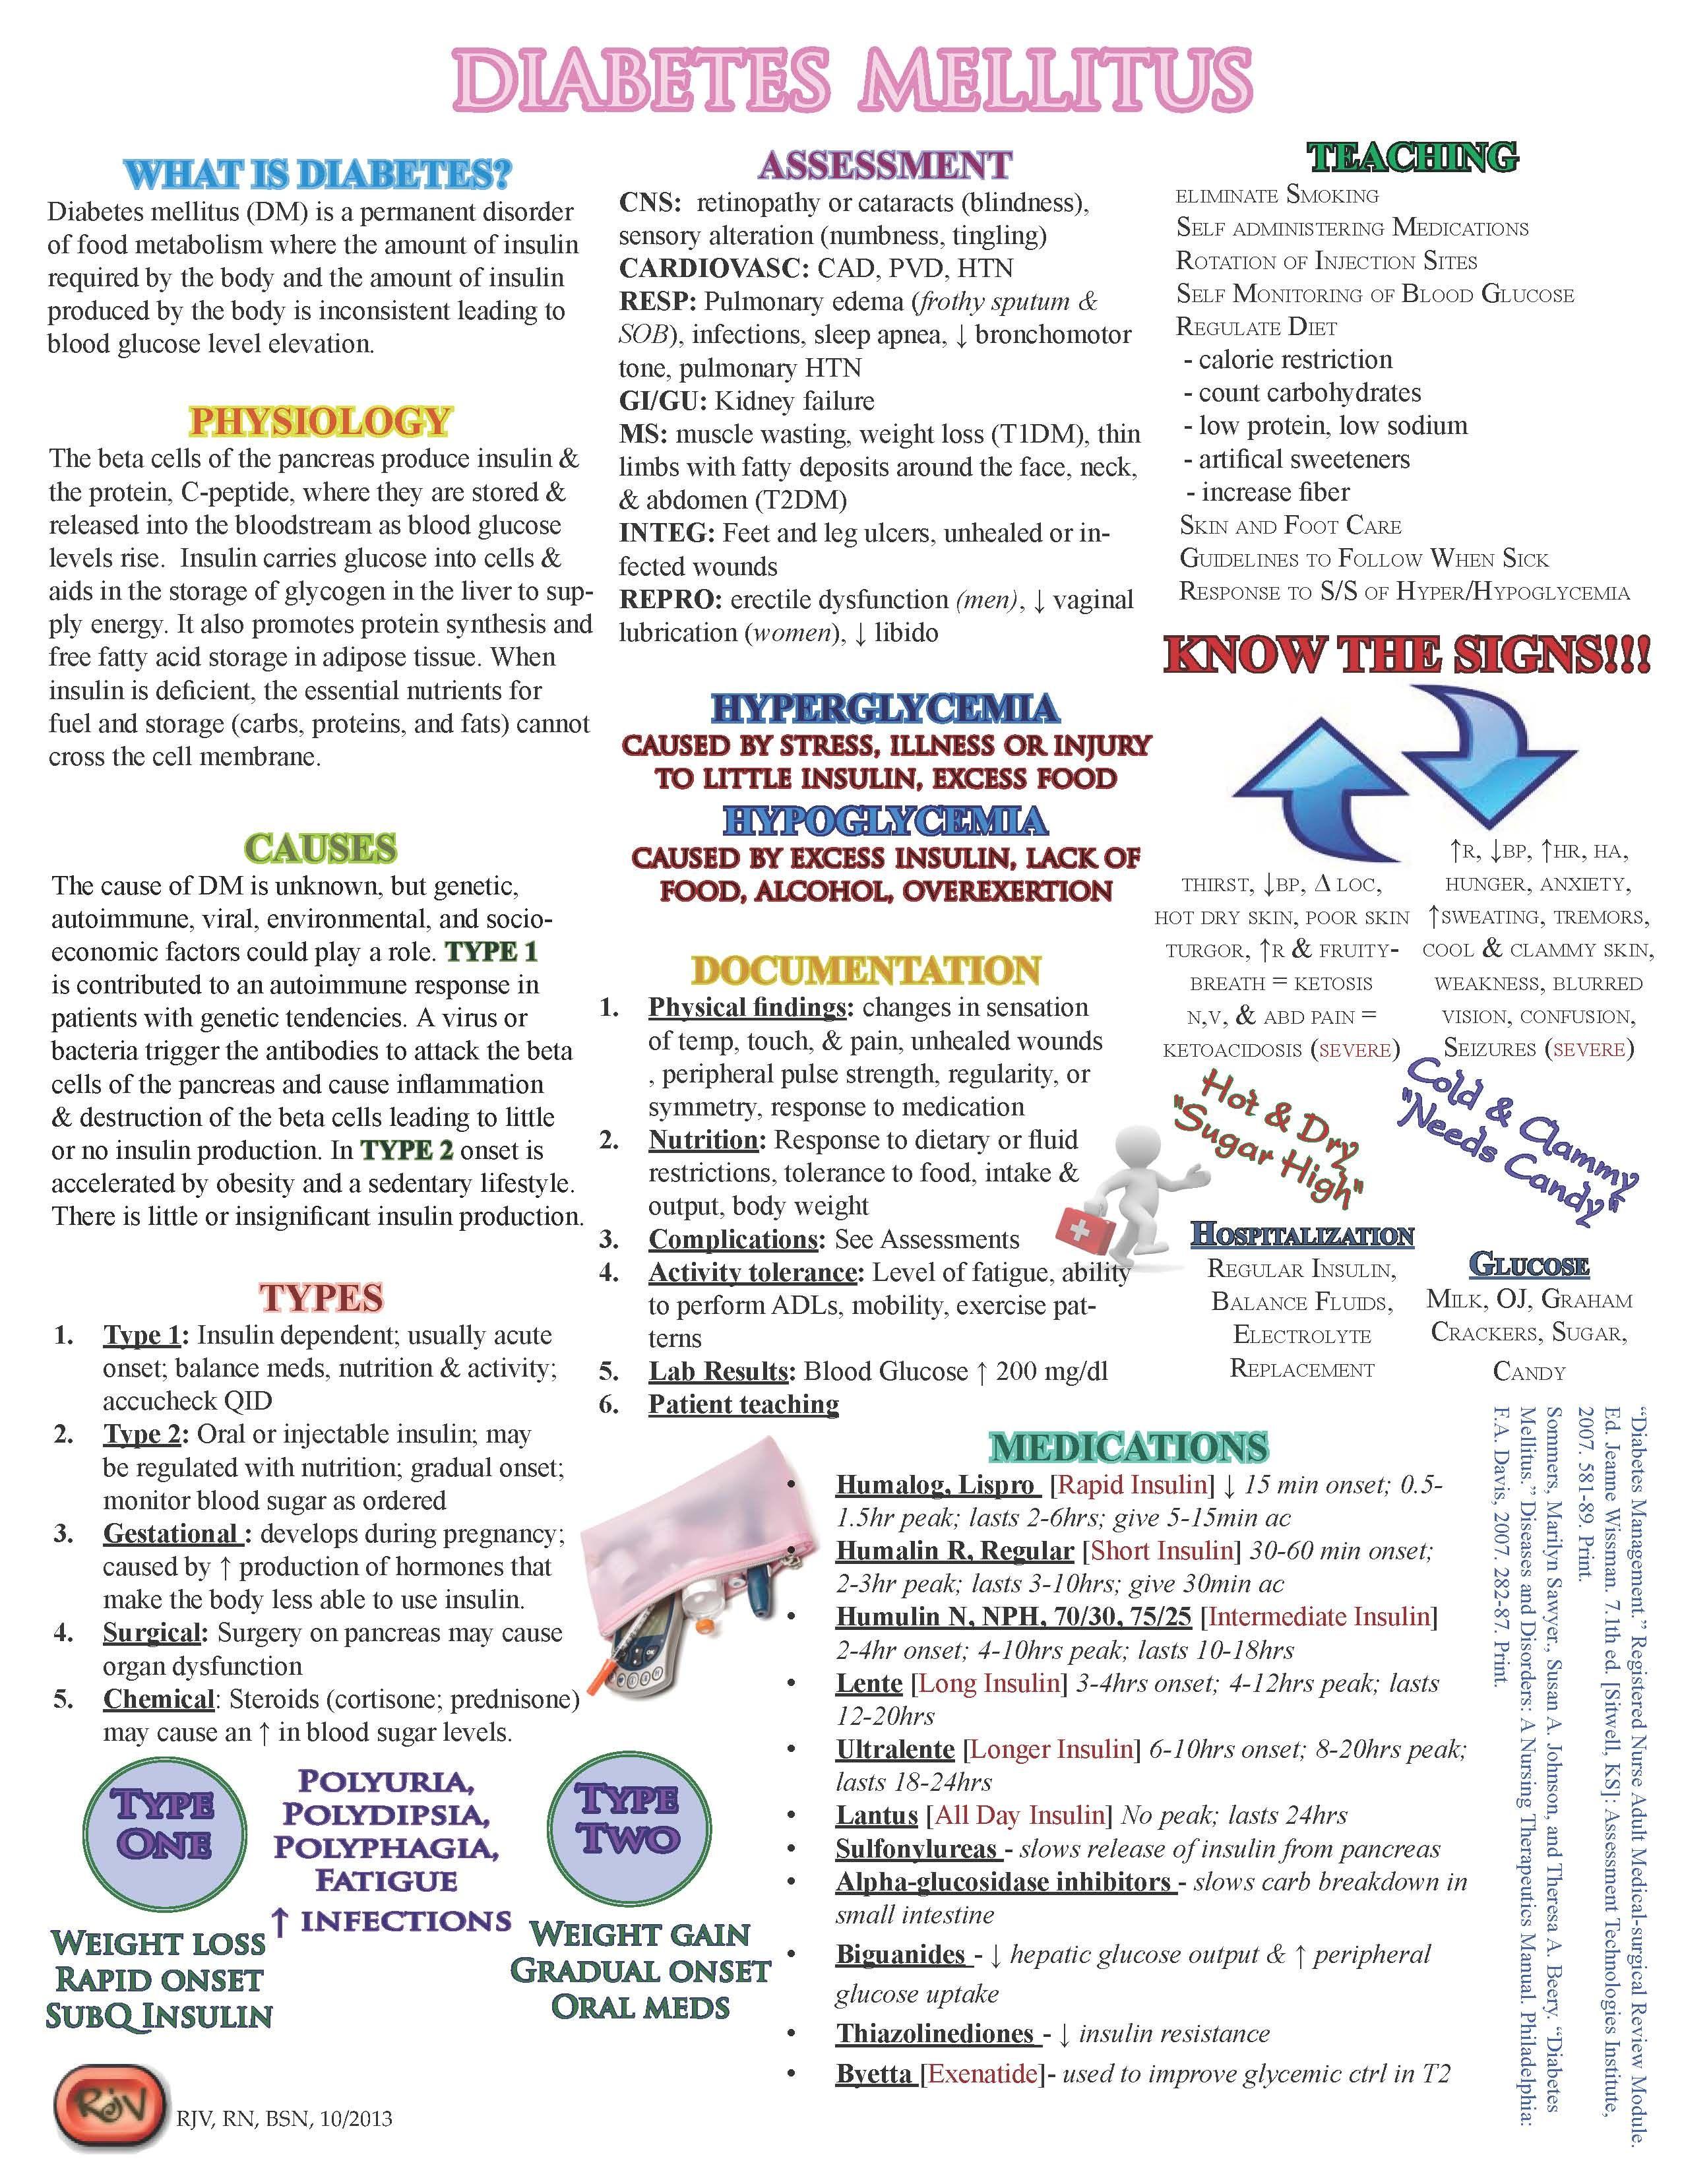 pediatric fluid and electrolyte balance critical care case studies 10022018 chapter 5: nursing care of patients with fluid, electrolyte, and acid-base imbalances wilson, bruce k // understanding medical-surgical nursing, 3rd.